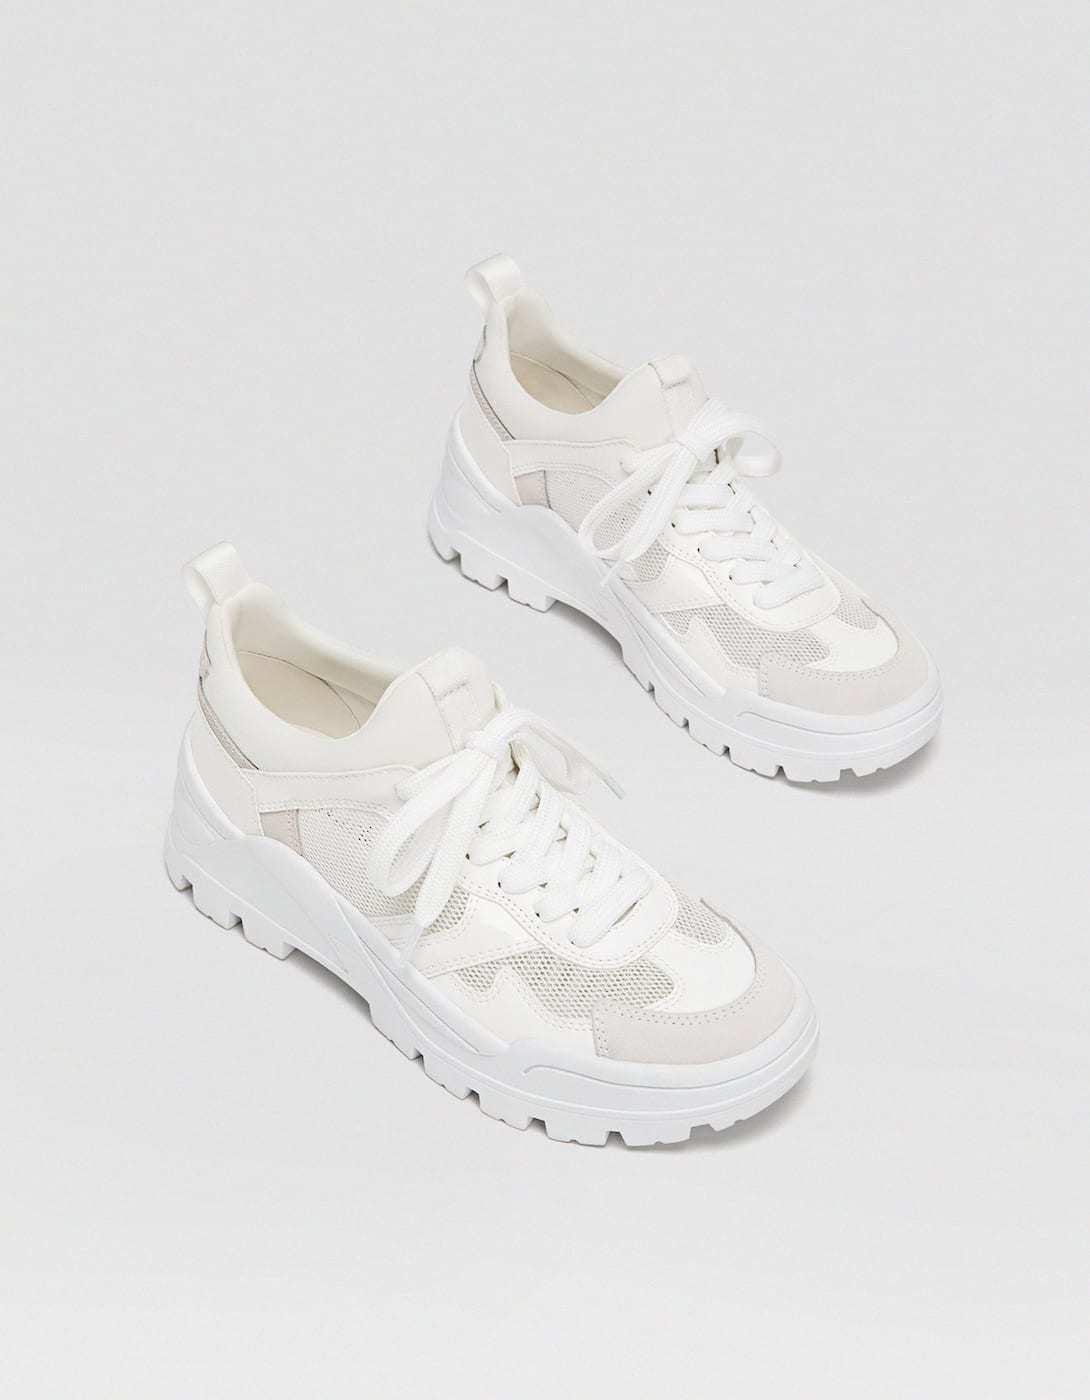 Sneakers blancas con plataforma, de Stradivarius (39,99 euros).